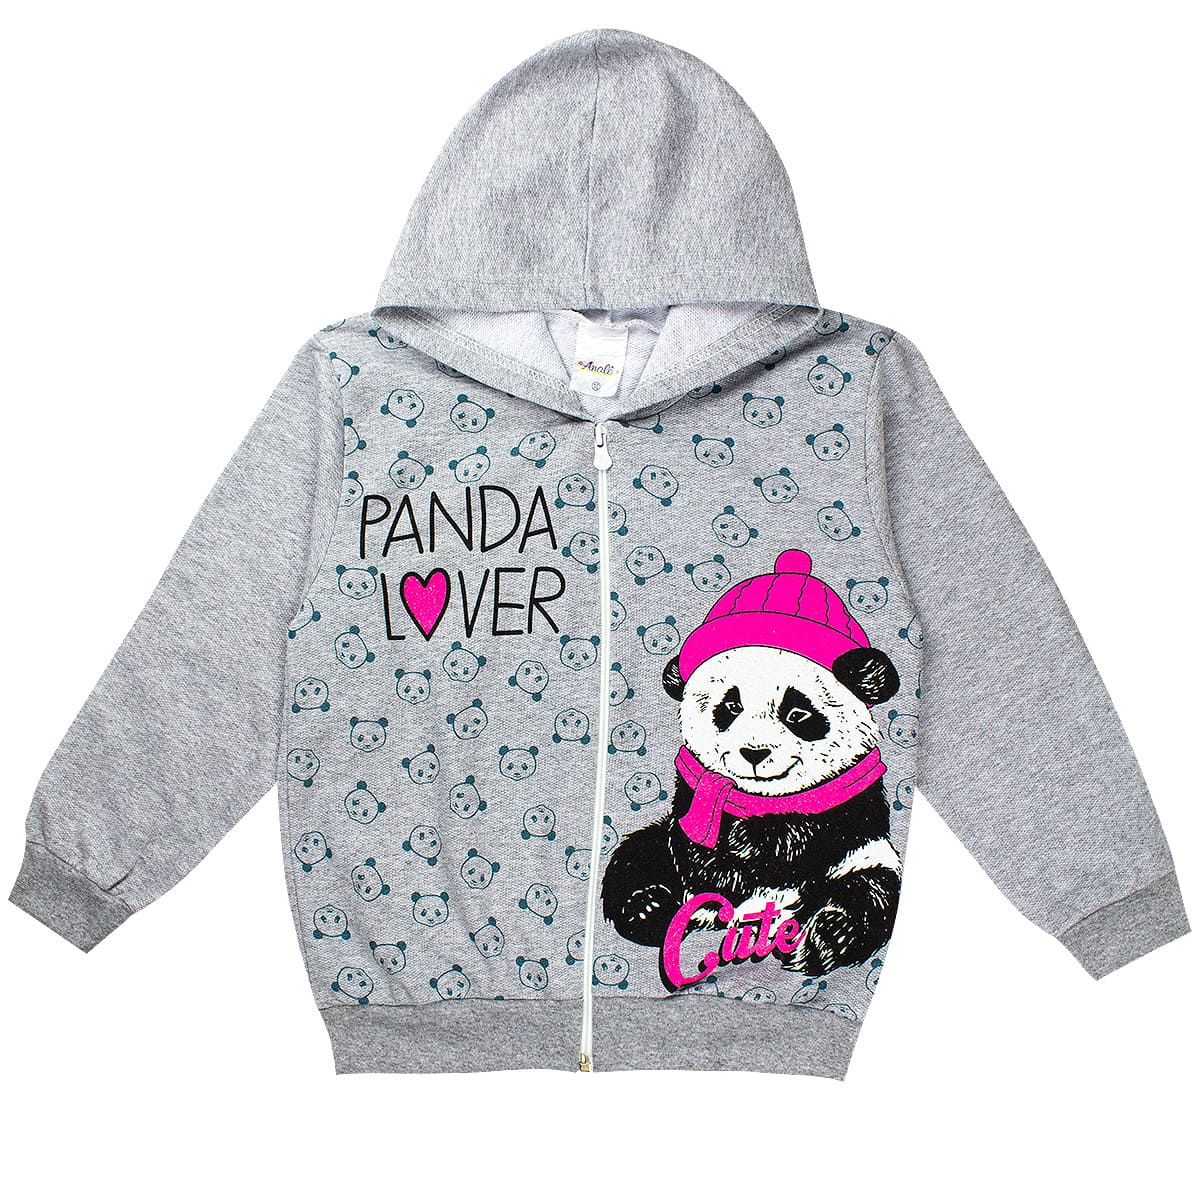 Jaqueta Infantil Menina Panda Lover Mescla Analê